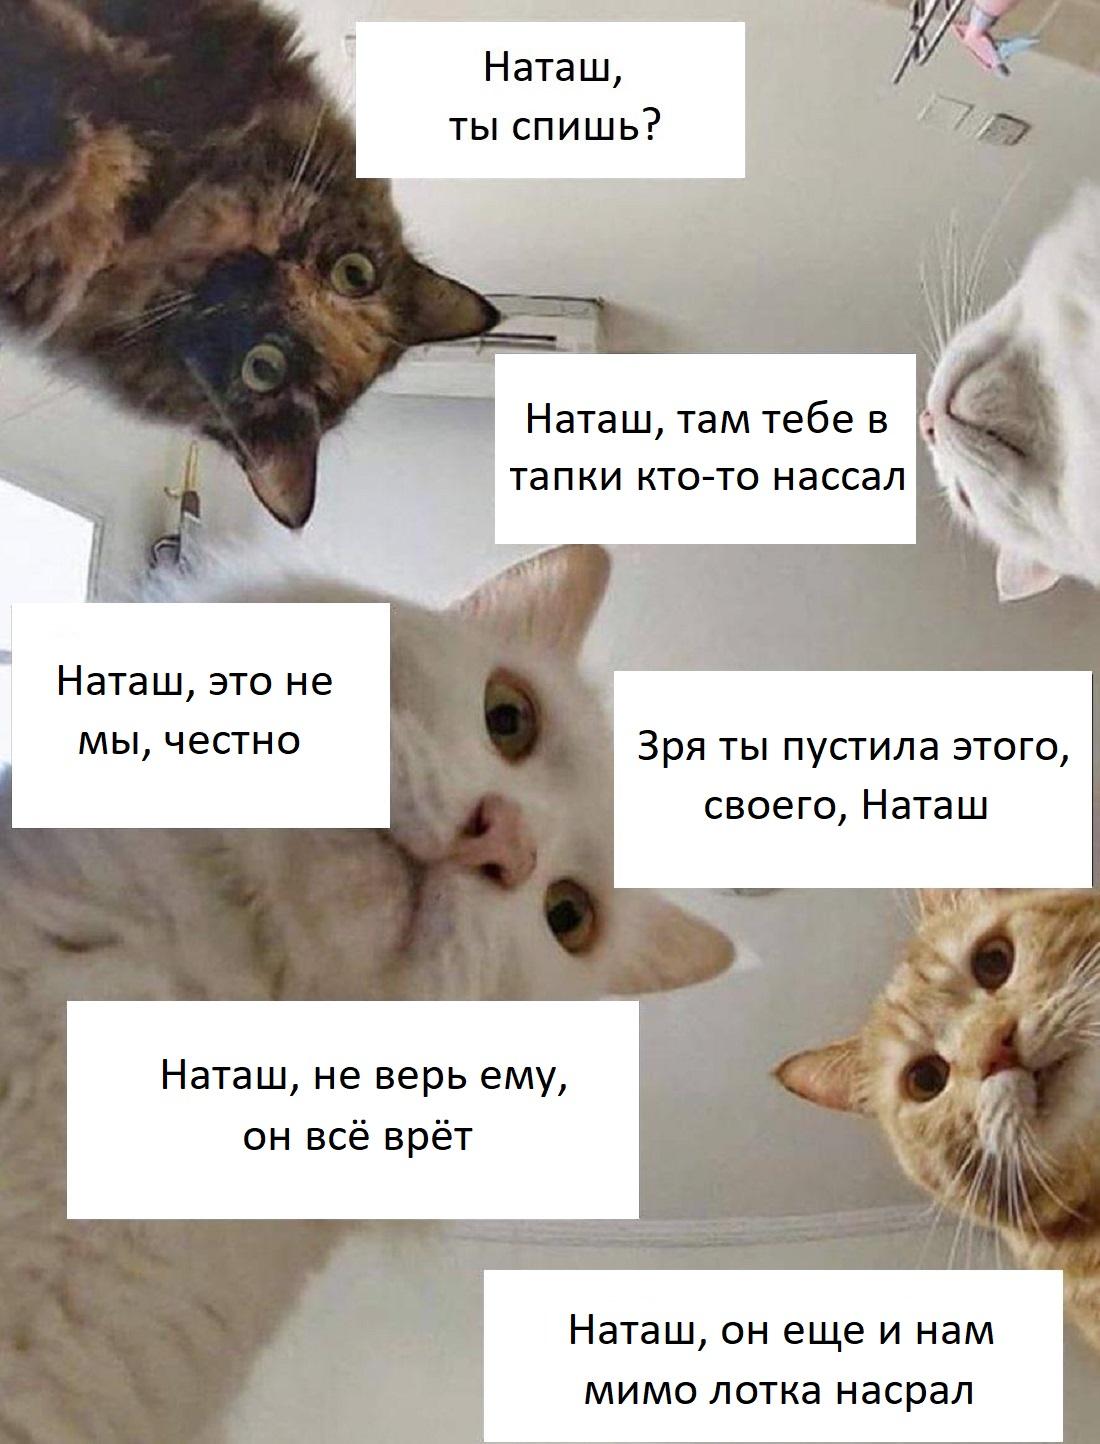 3. Наташ, ты спишь?